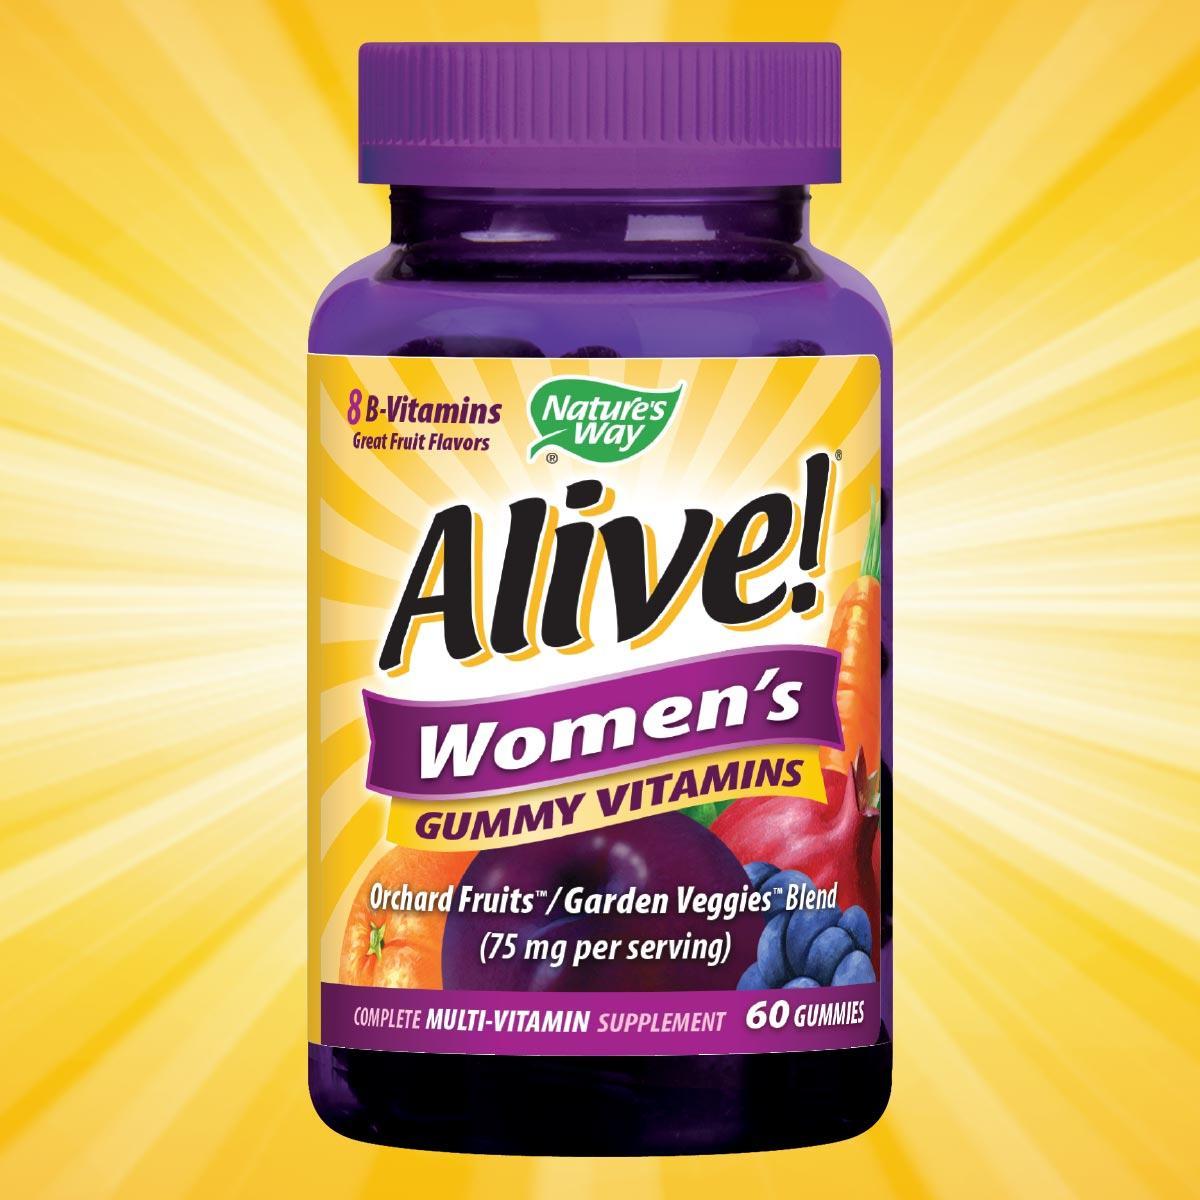 Natures Made Prenatal Vitamins Dha